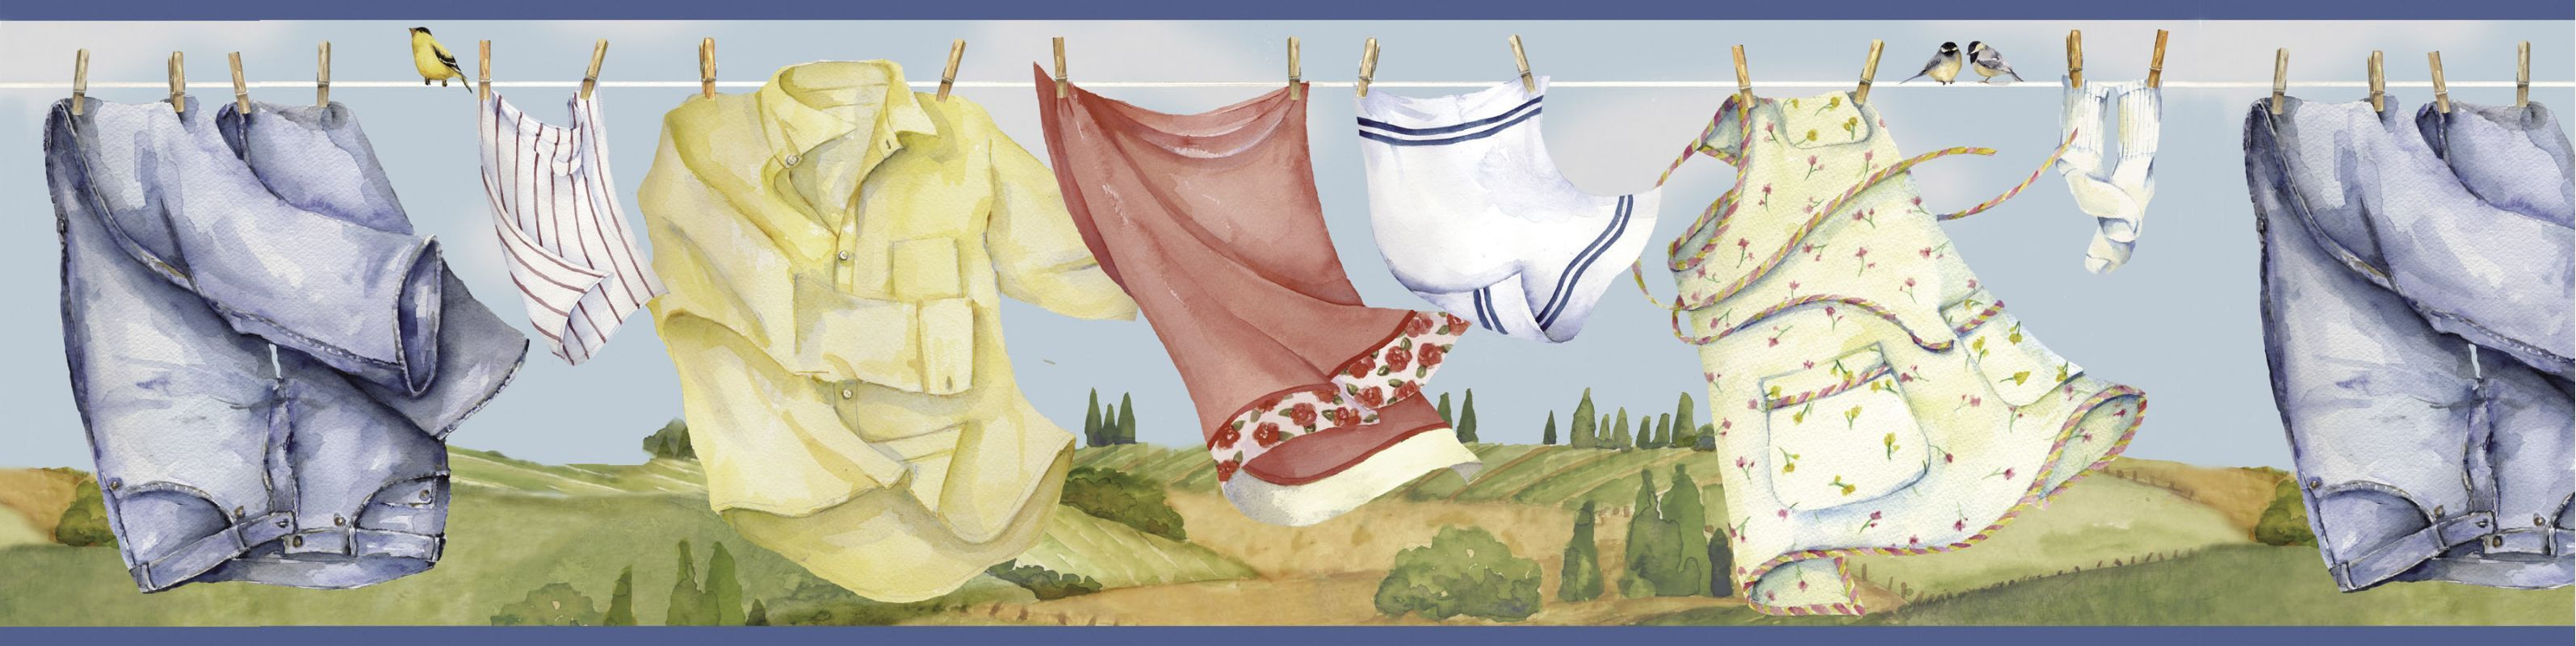 Brewster Ffr05121b Clothes Line Nursery Wallpaper Laundry Room Wallpaper